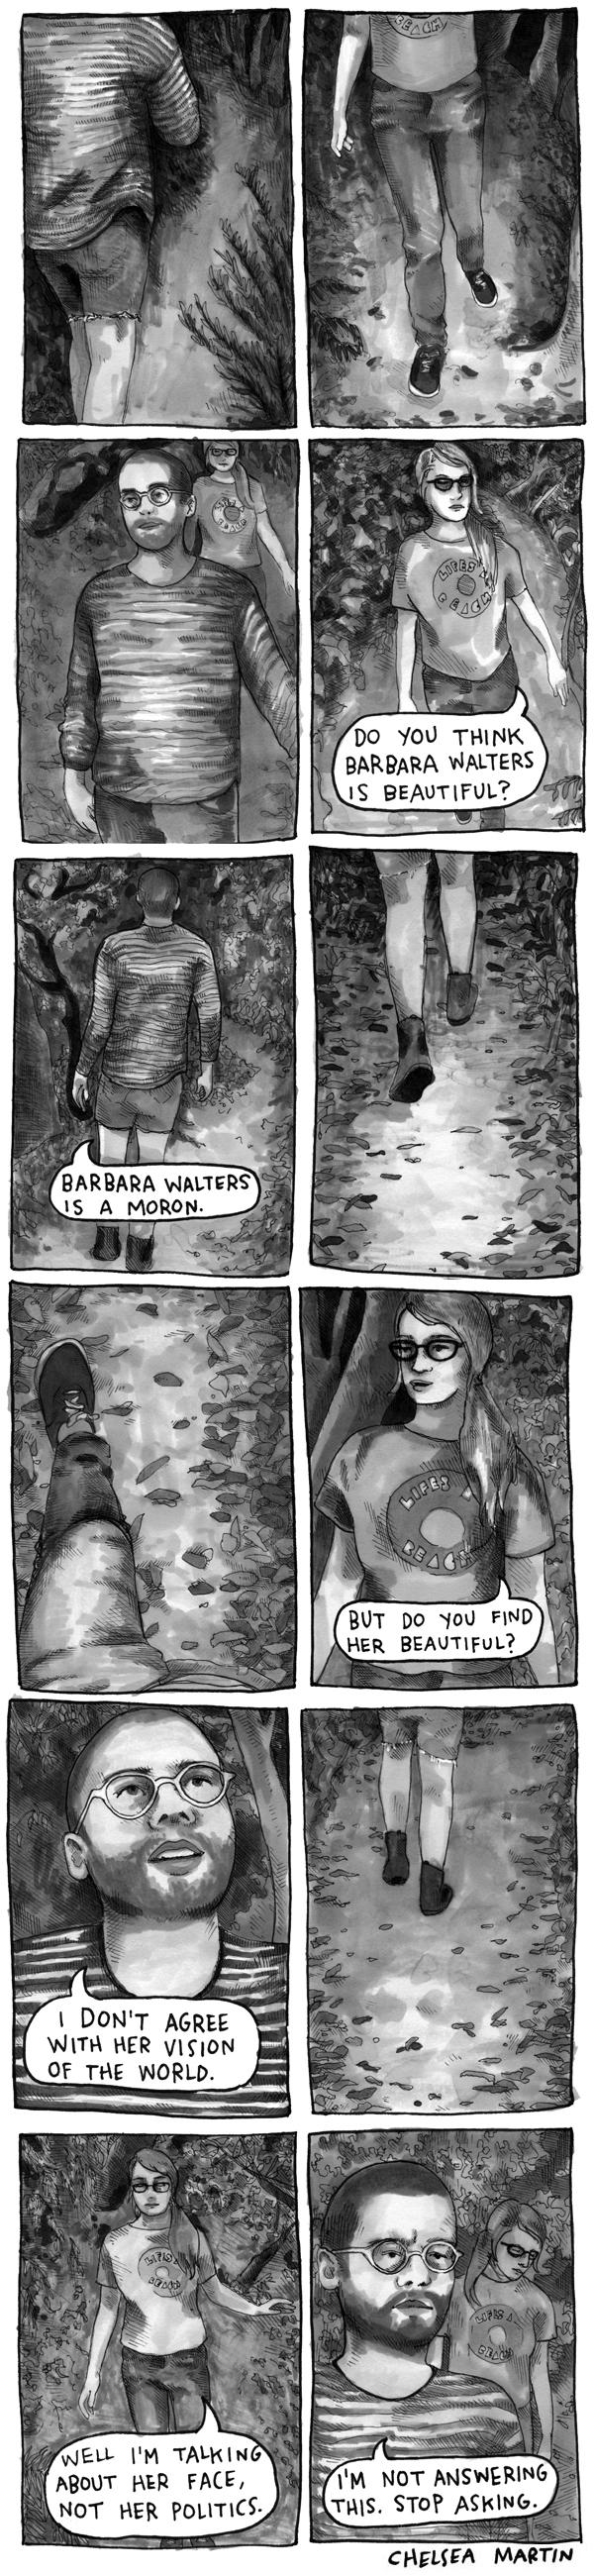 barbara-walters